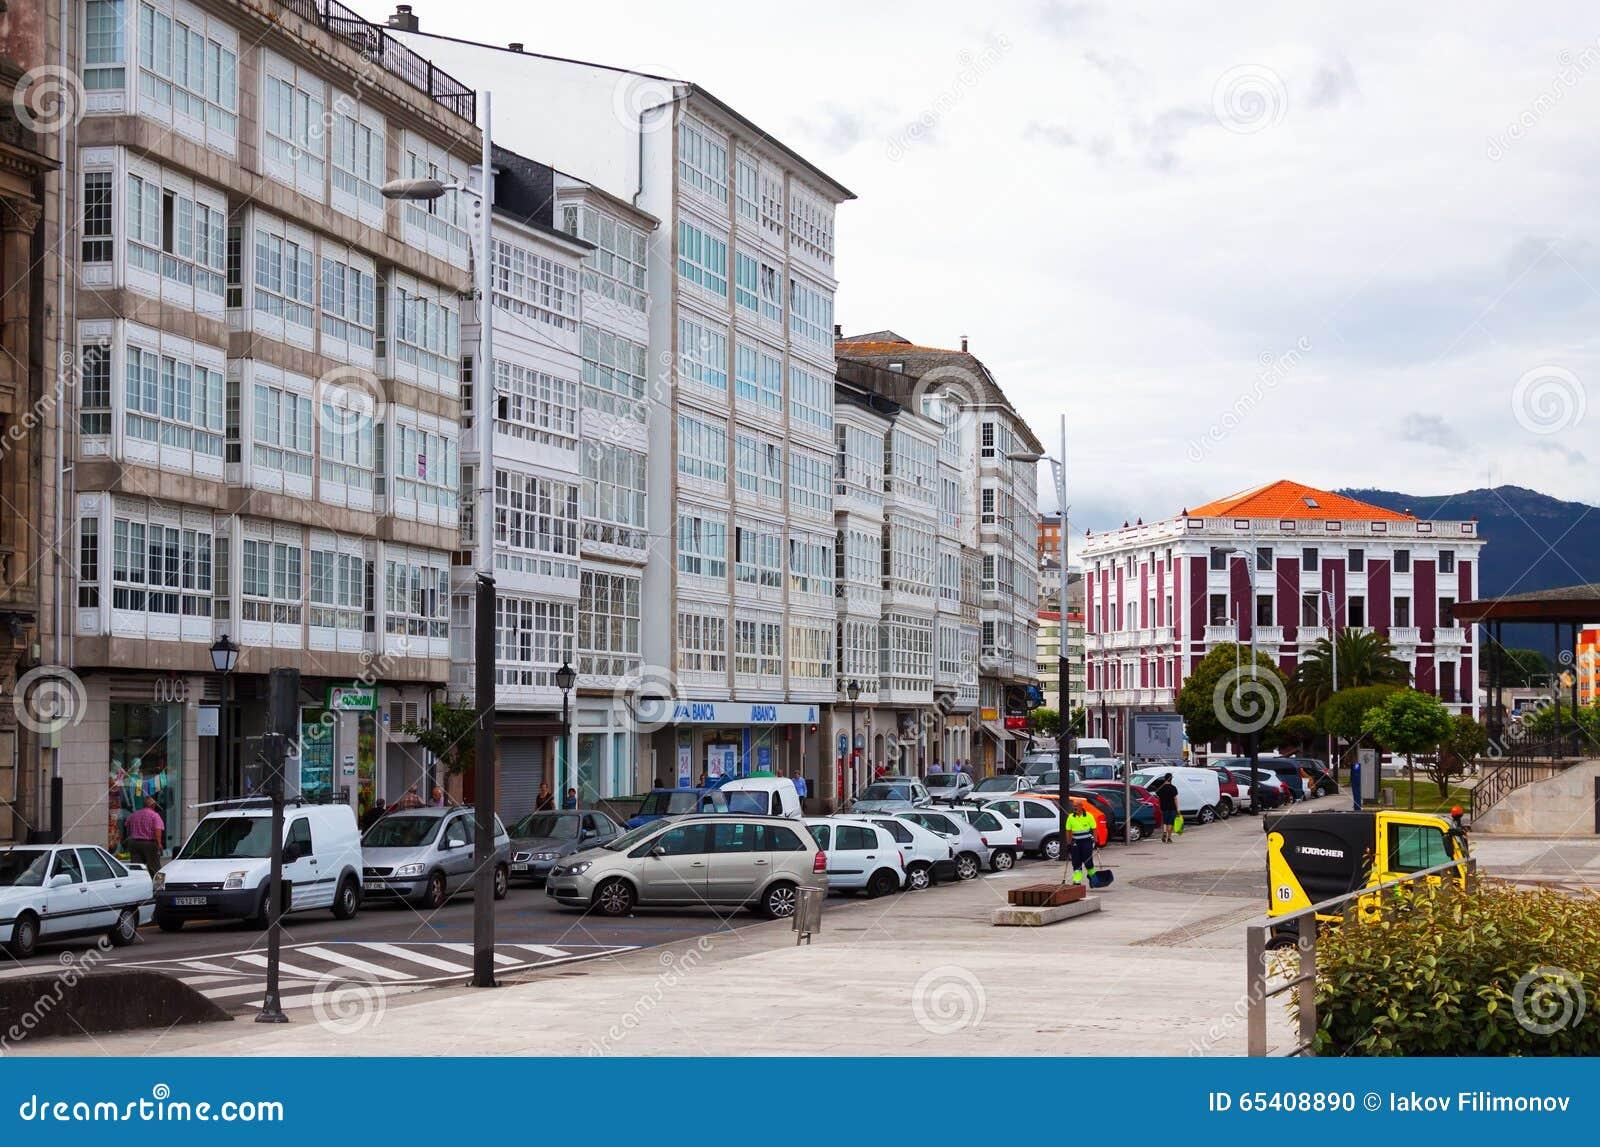 Casas de vivienda en viveiro galicia espa a imagen - Casas sostenibles espana ...